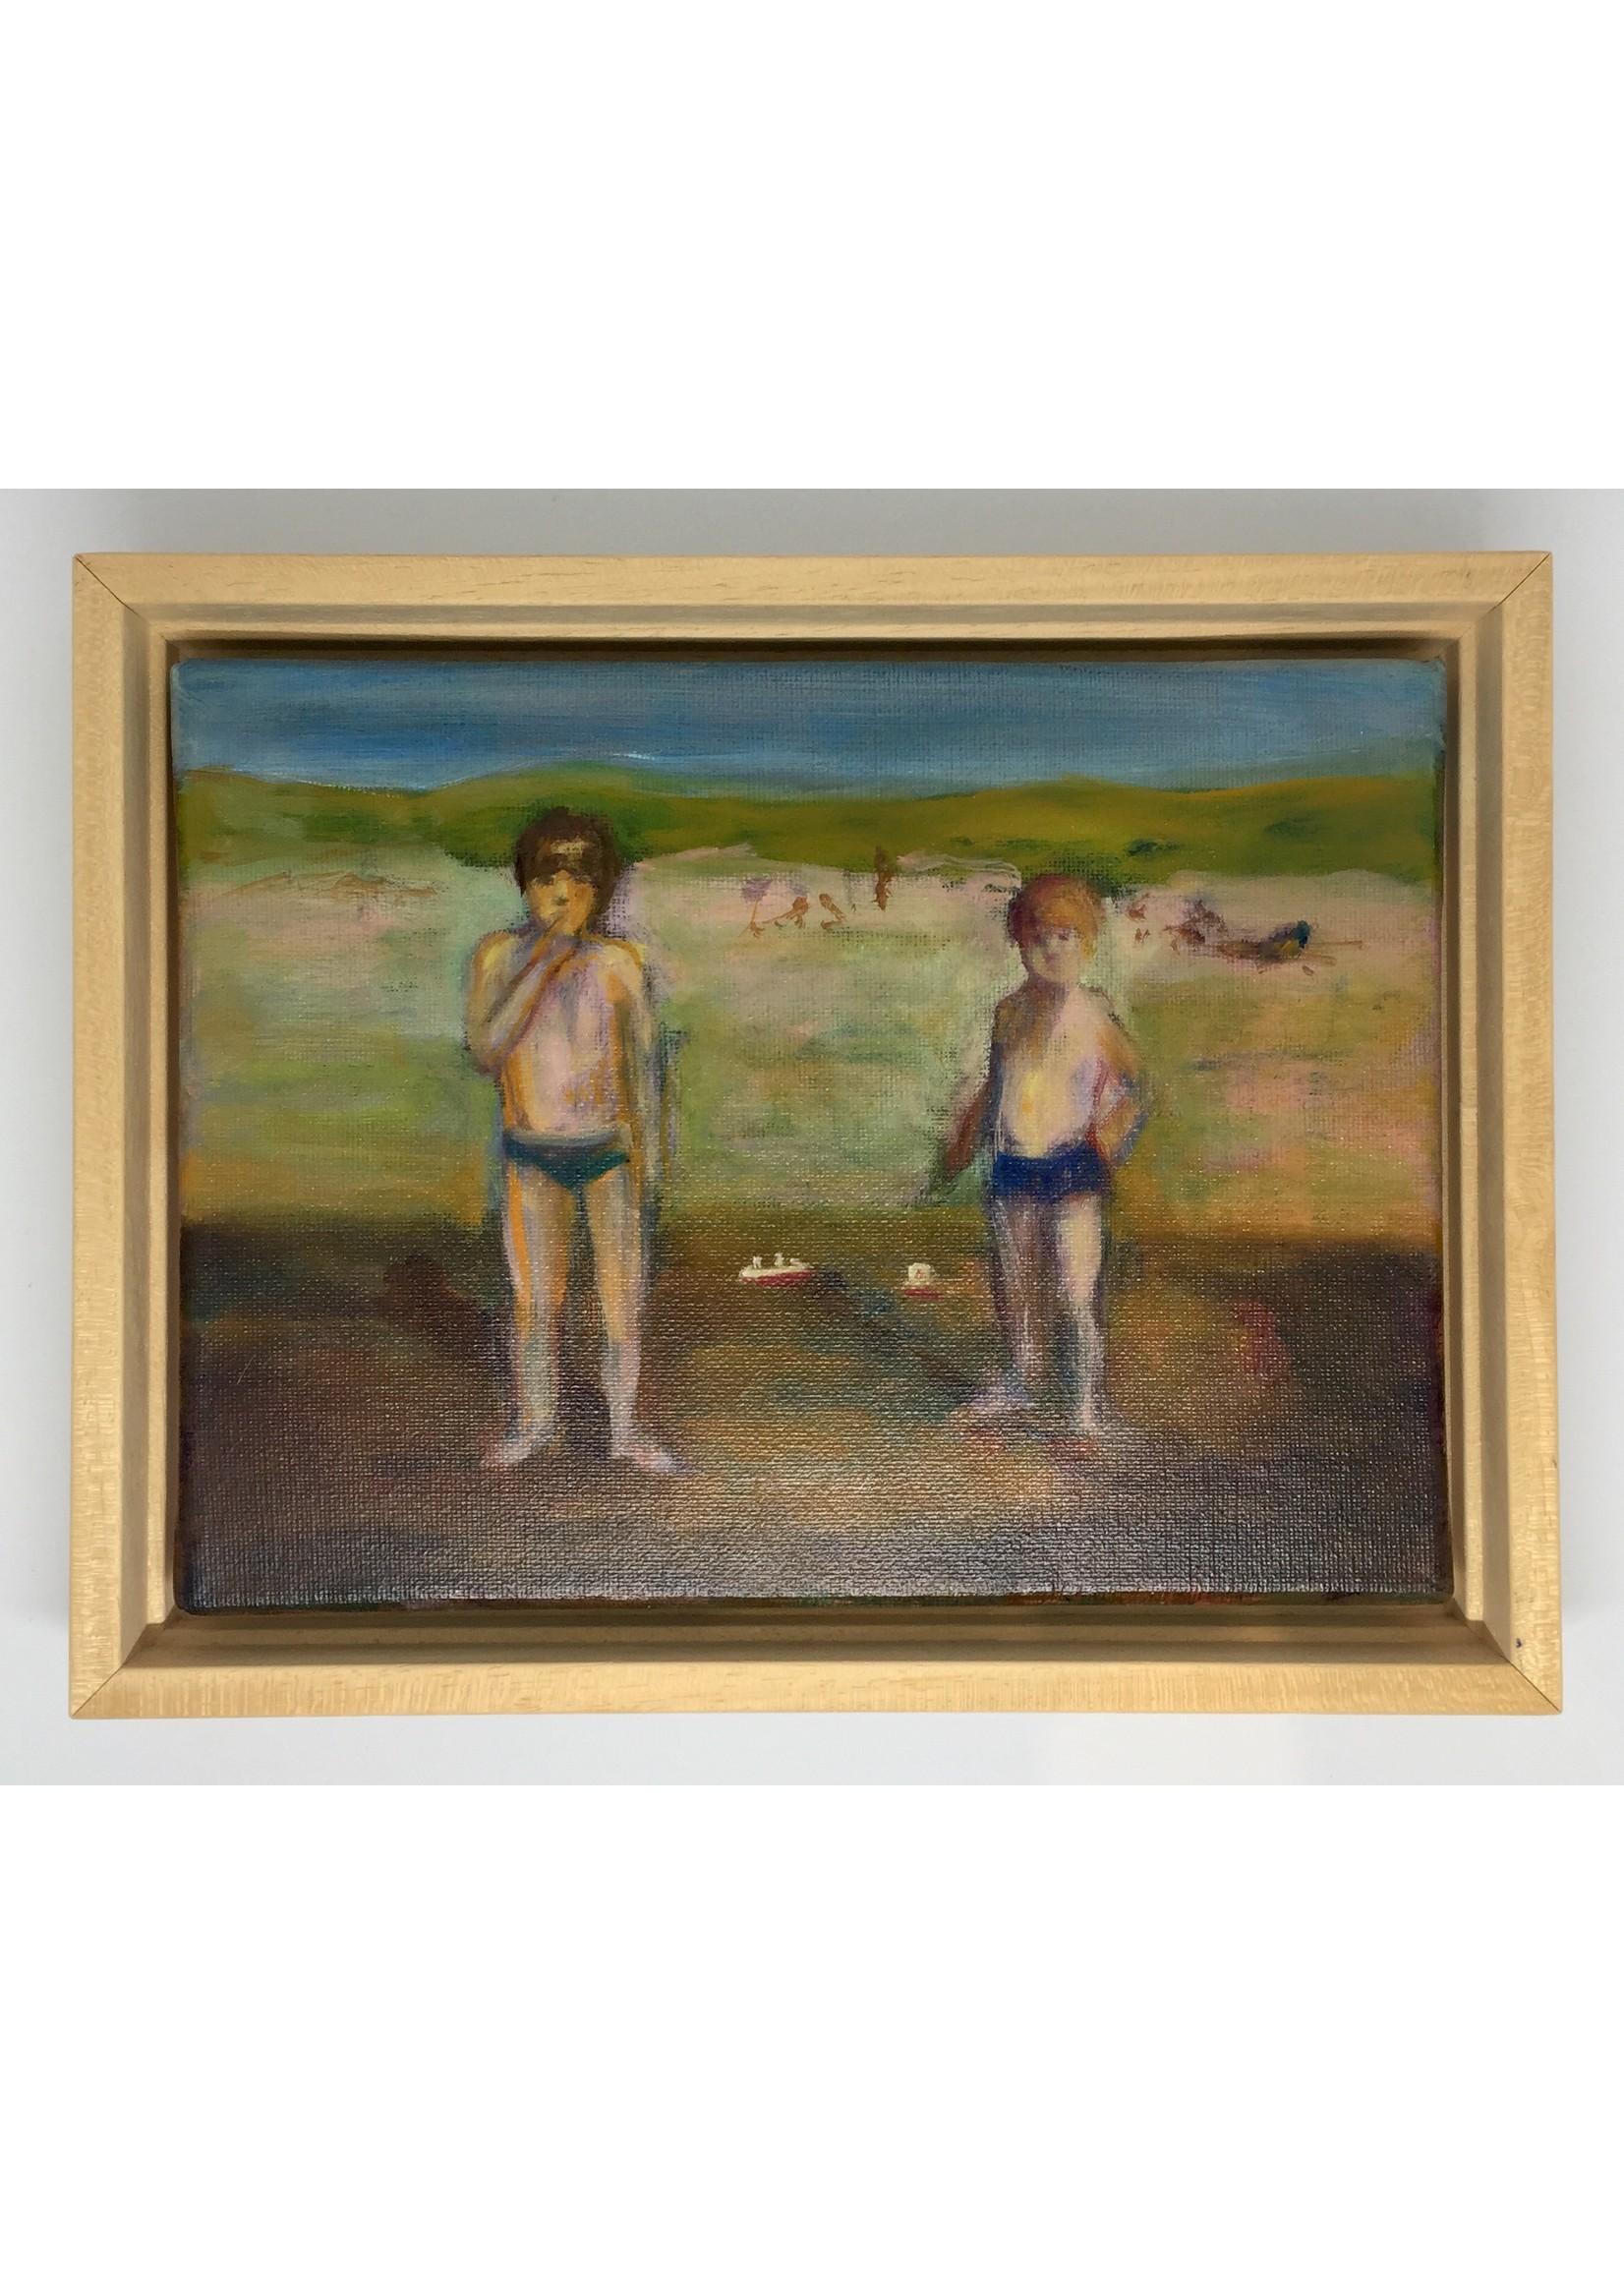 'Dampfer' - Bea van Huystee (Öl auf Leinwand)